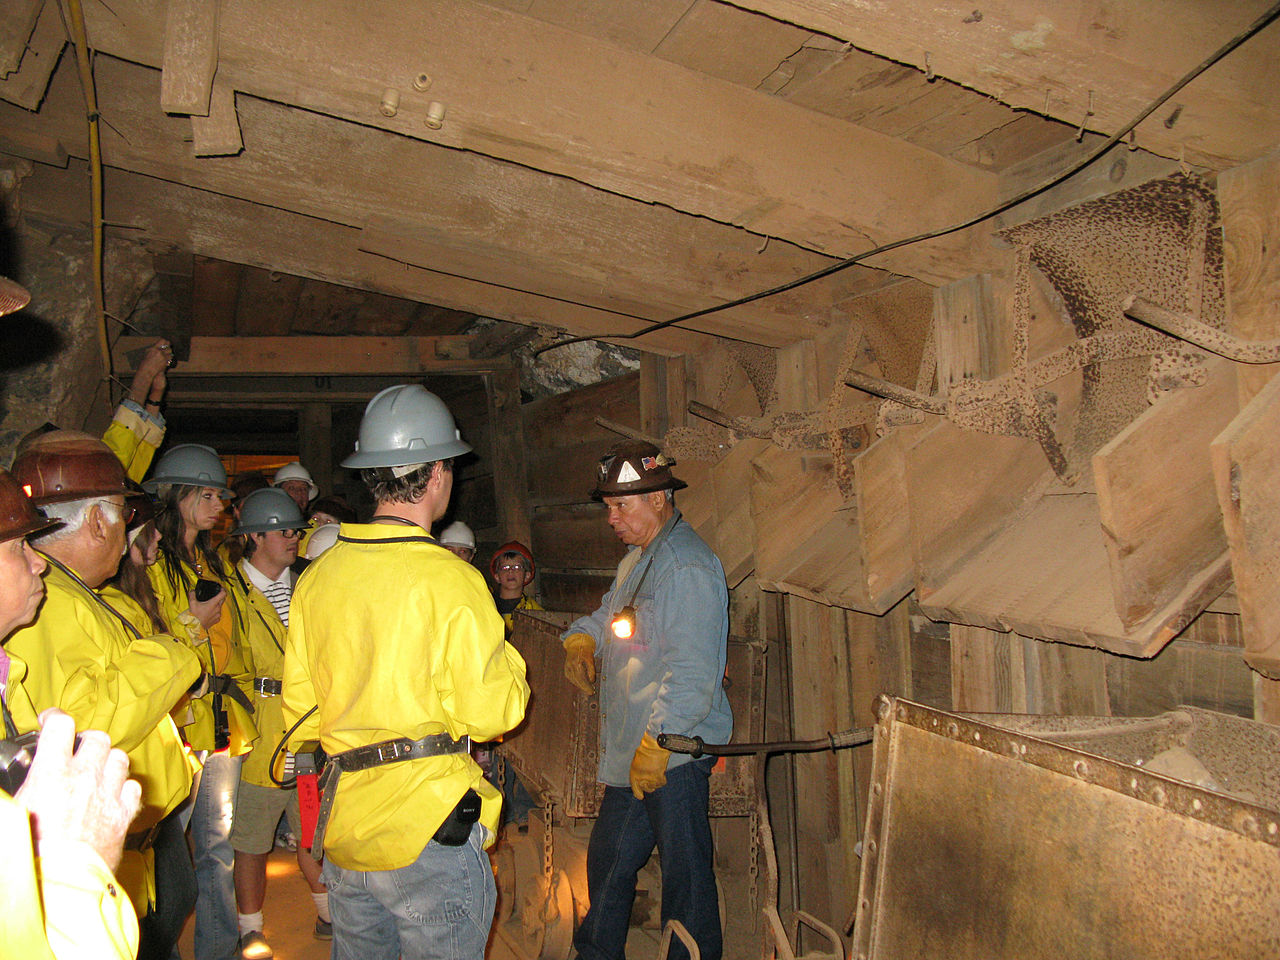 Copper Queen Mine - Best Place To Visit in Bisbee